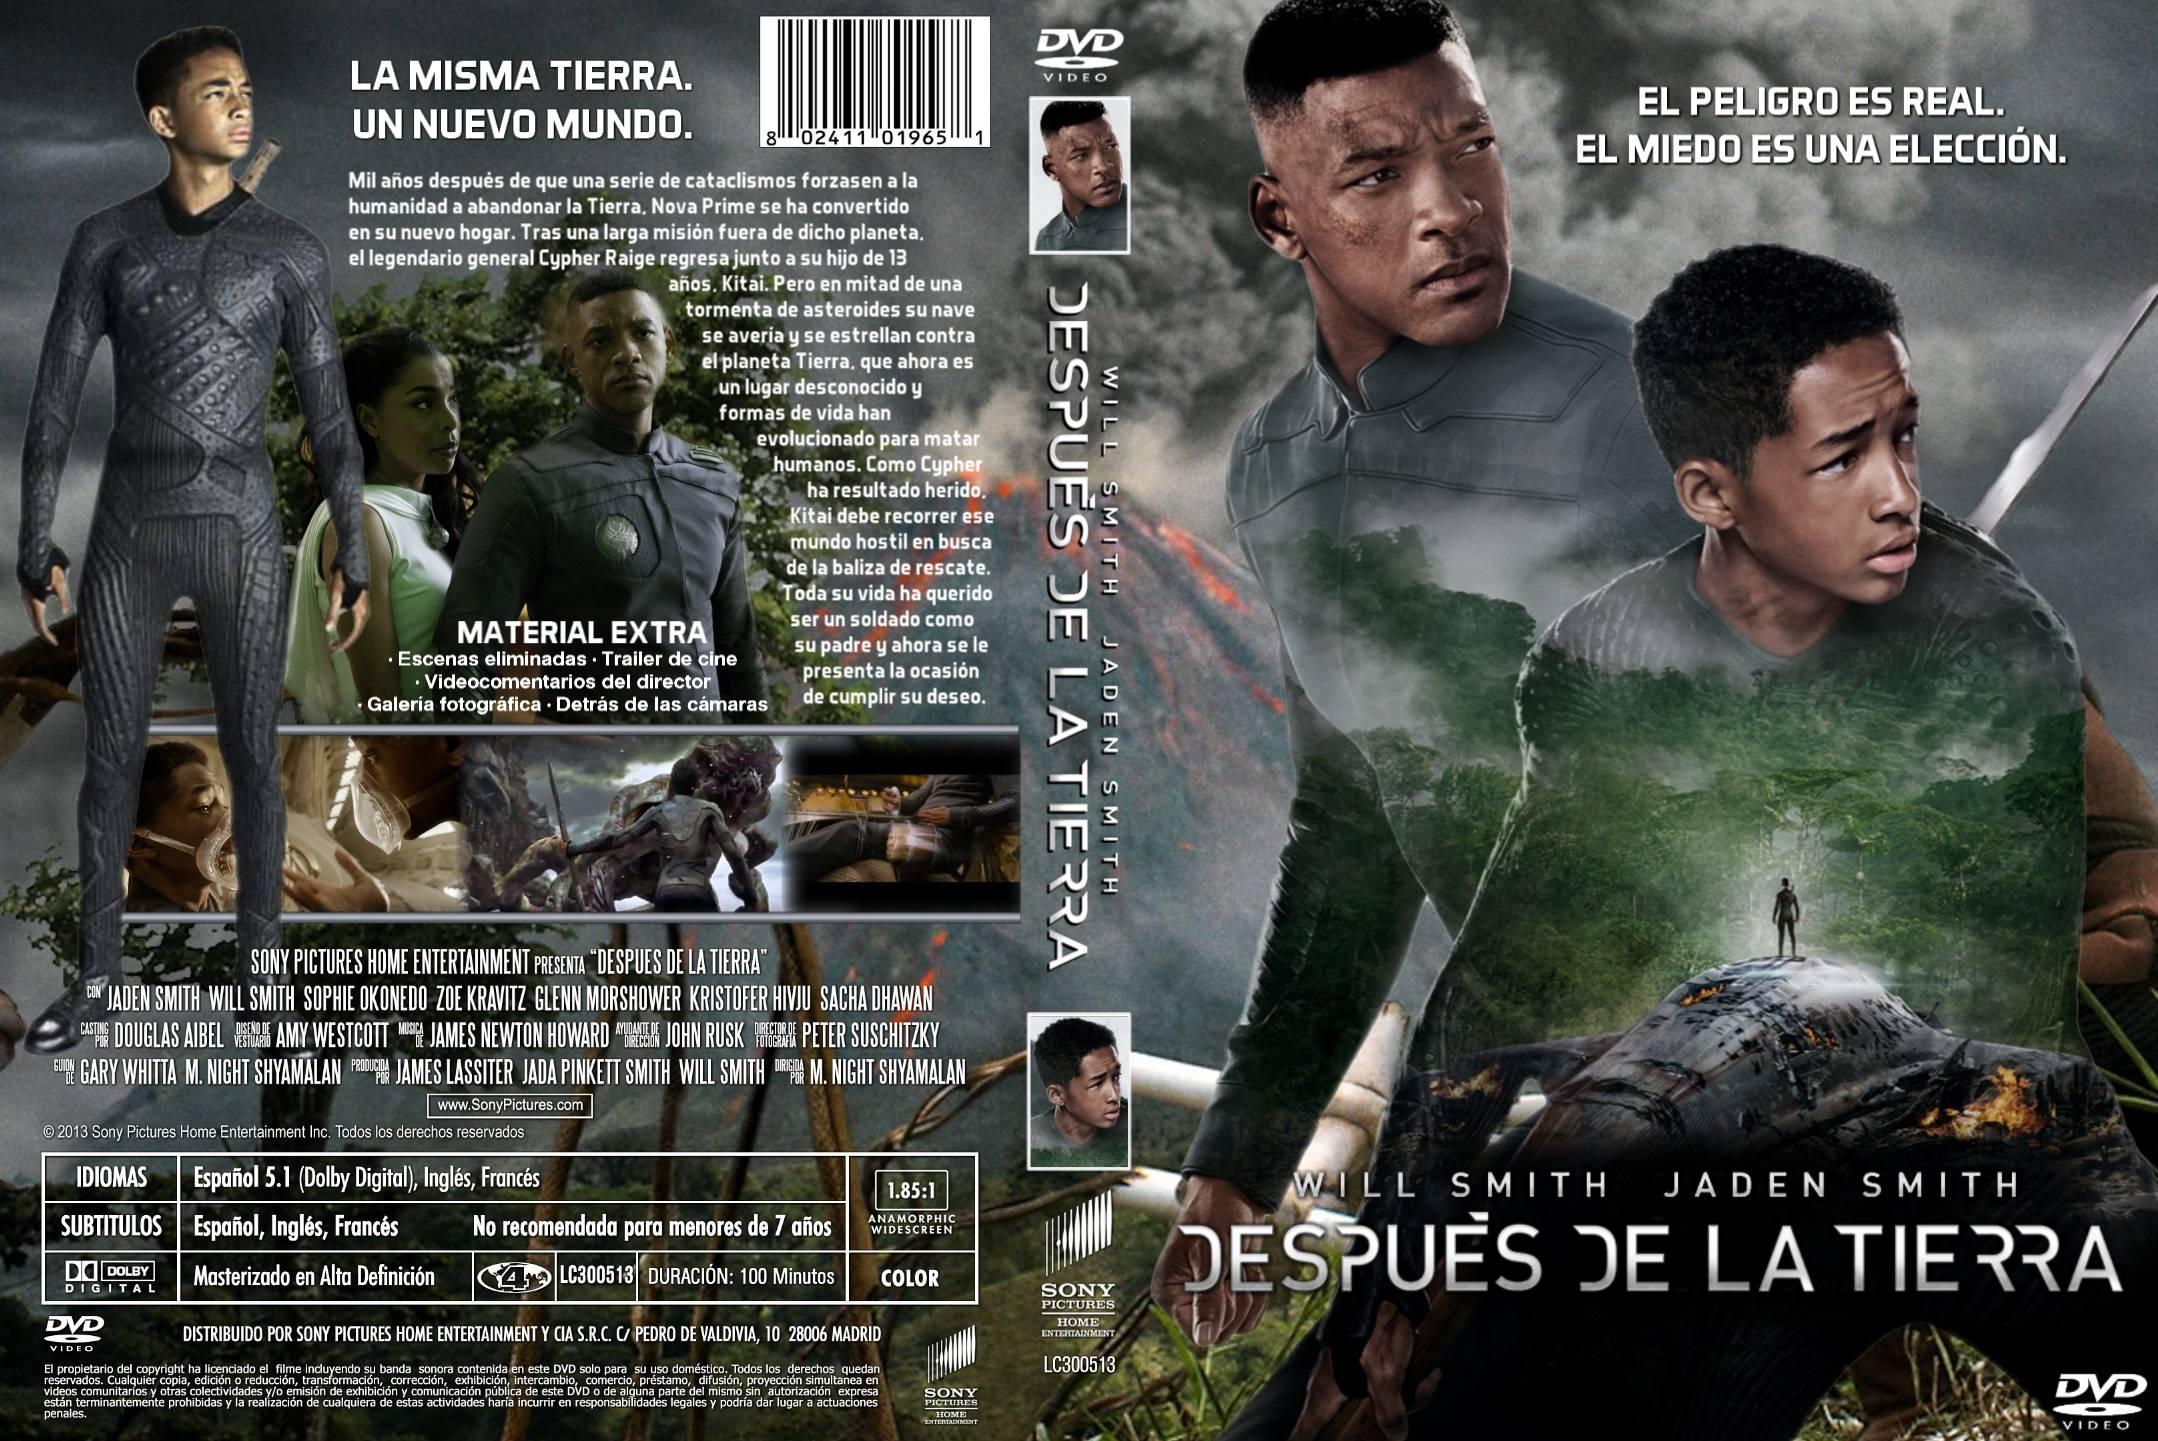 Después de la Tierra (2013) [Dvdrip Latino] [Zippyshare]